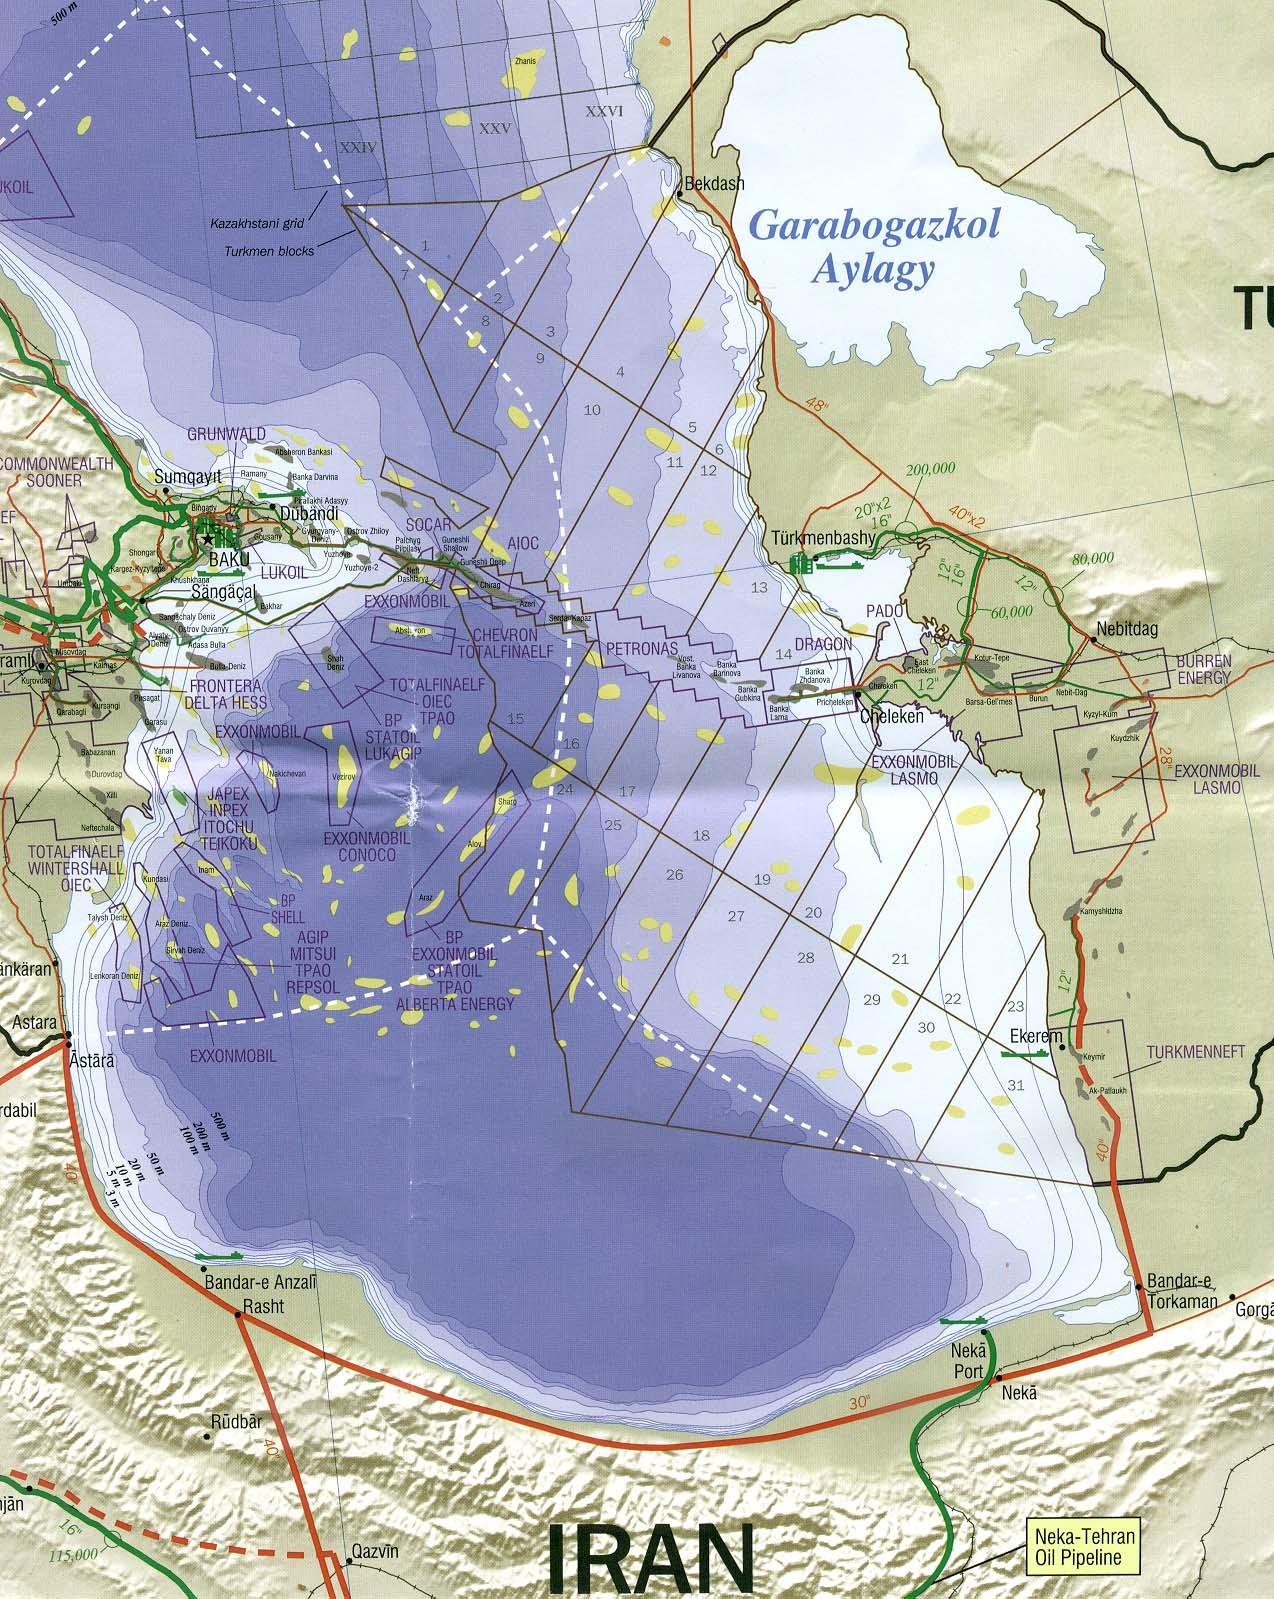 http://karty.narod.ru/claim/kaspij/Caspian_Sea_s_rel01.jpg